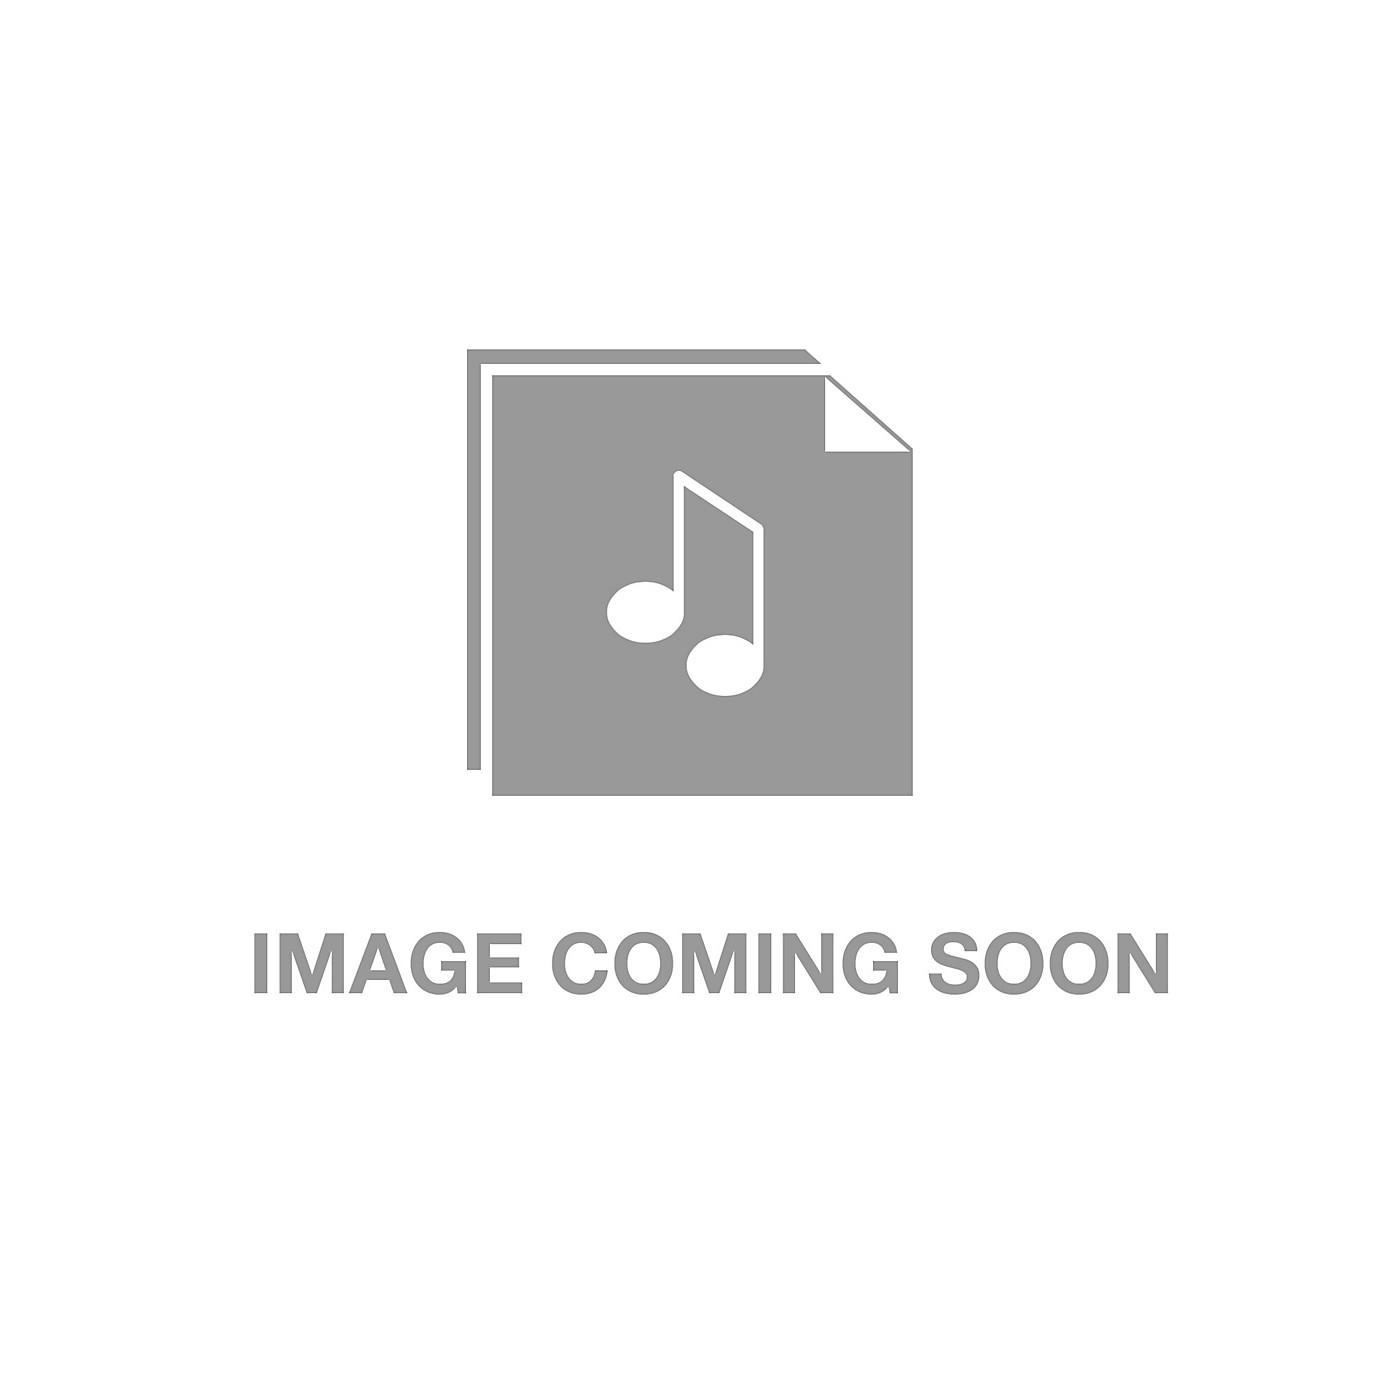 Hal Leonard Sleep Concert Band Level 3.5 Composed by Eric Whitacre thumbnail